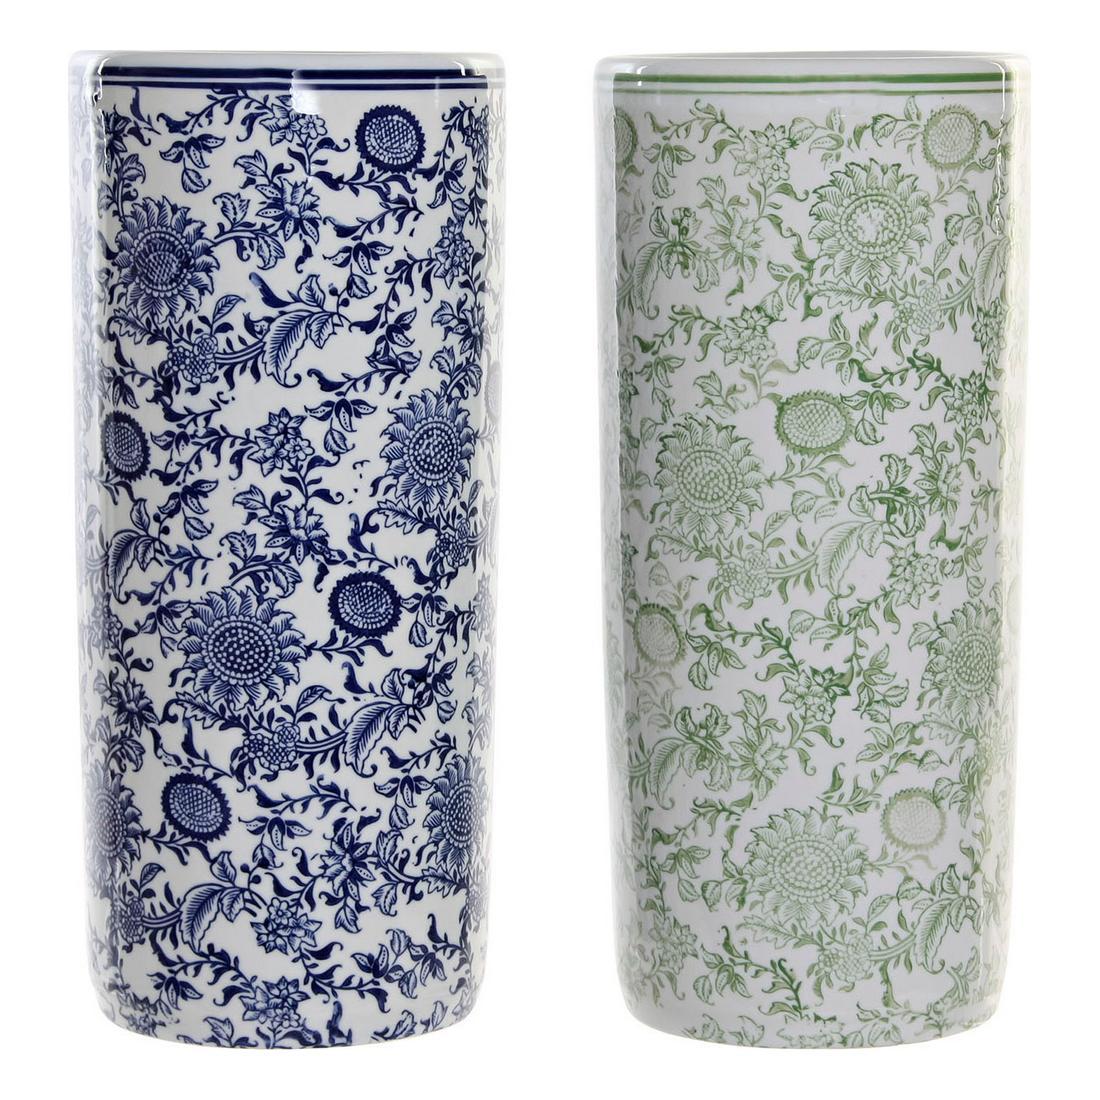 Umbrella stand DKD Home Decor Blue Green Porcelain (2 pcs) (19.5 x 19.5 x 44 cm)